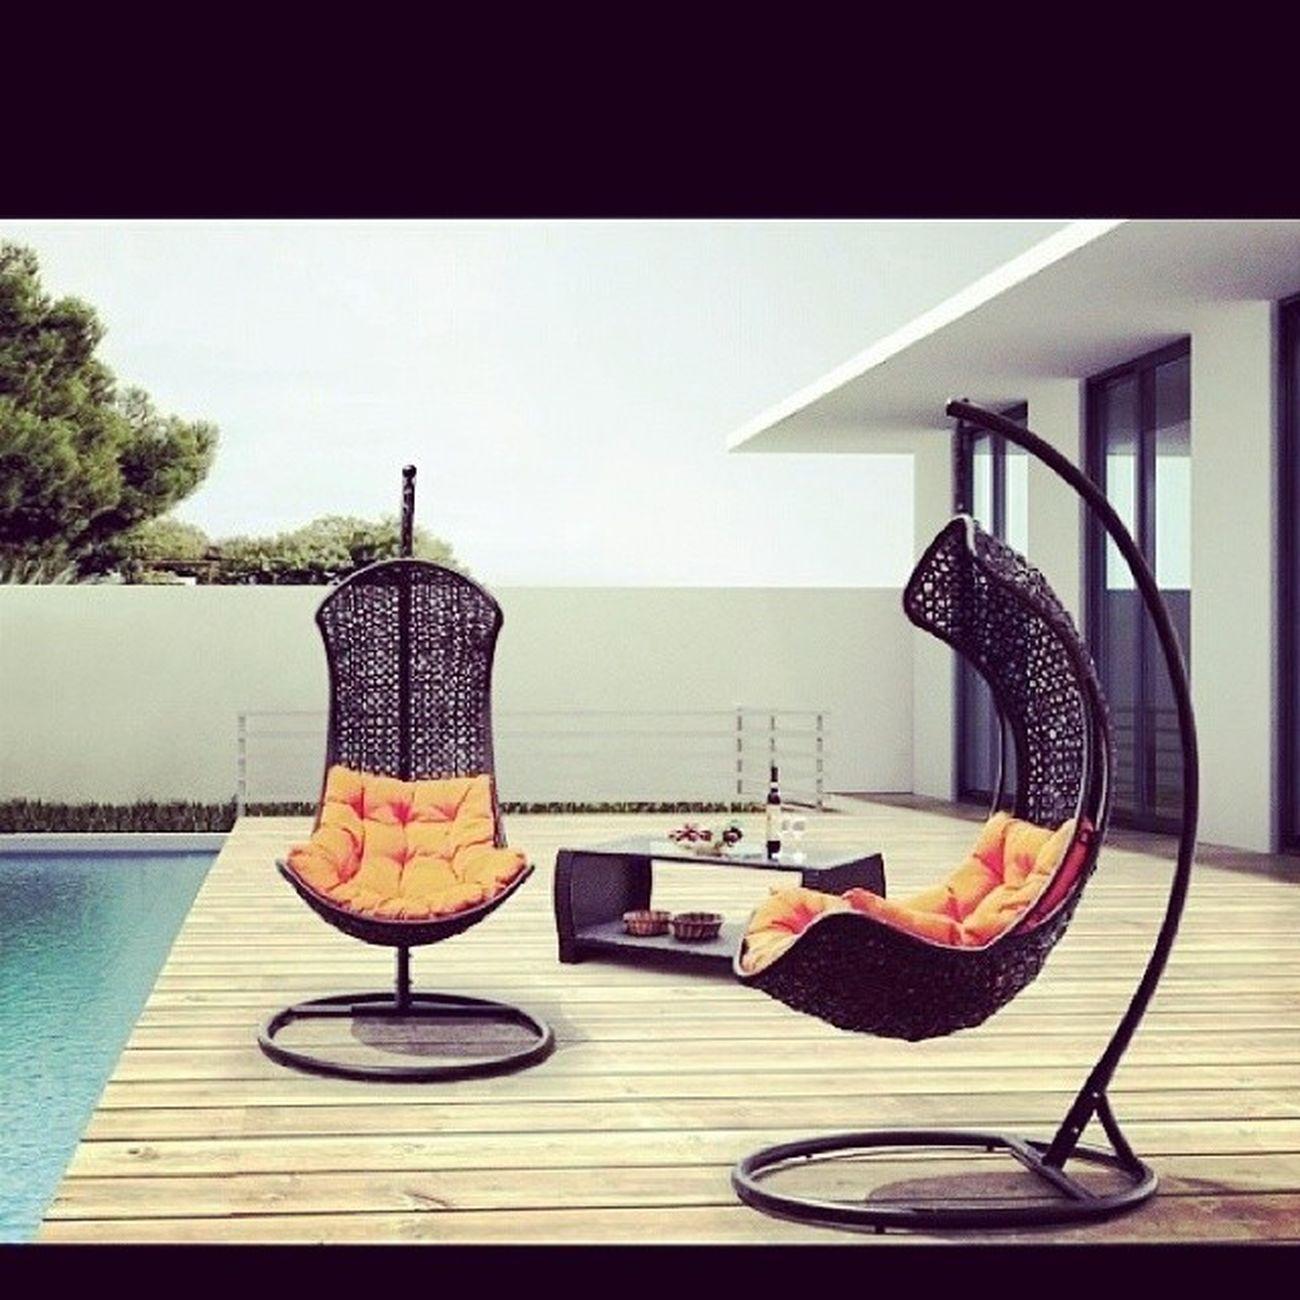 Curveswingchair Life Home Chair instaphoto zelimtonaterasi